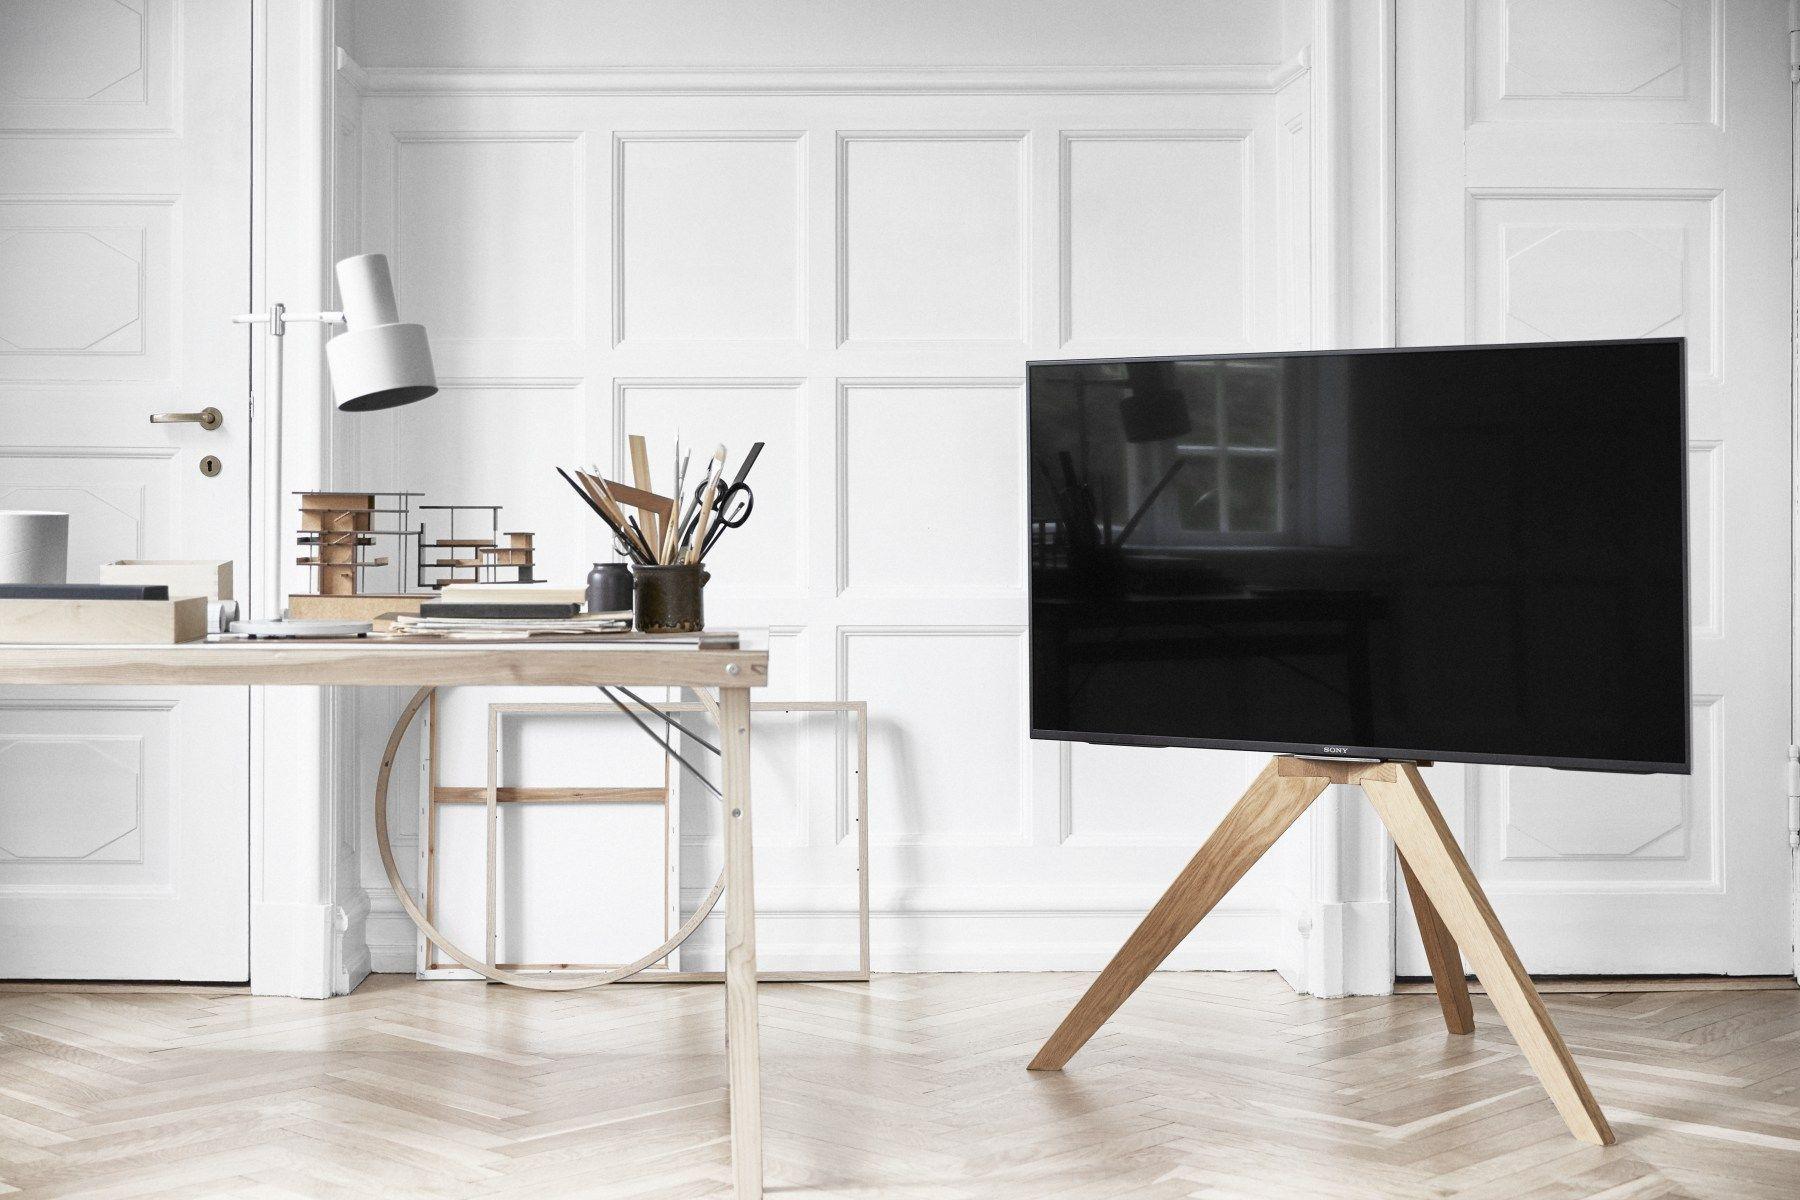 finest selection 8e383 54837 NEXT OP1 TV Floor Stand (Light Oak) | Home in 2019 | Tv ...